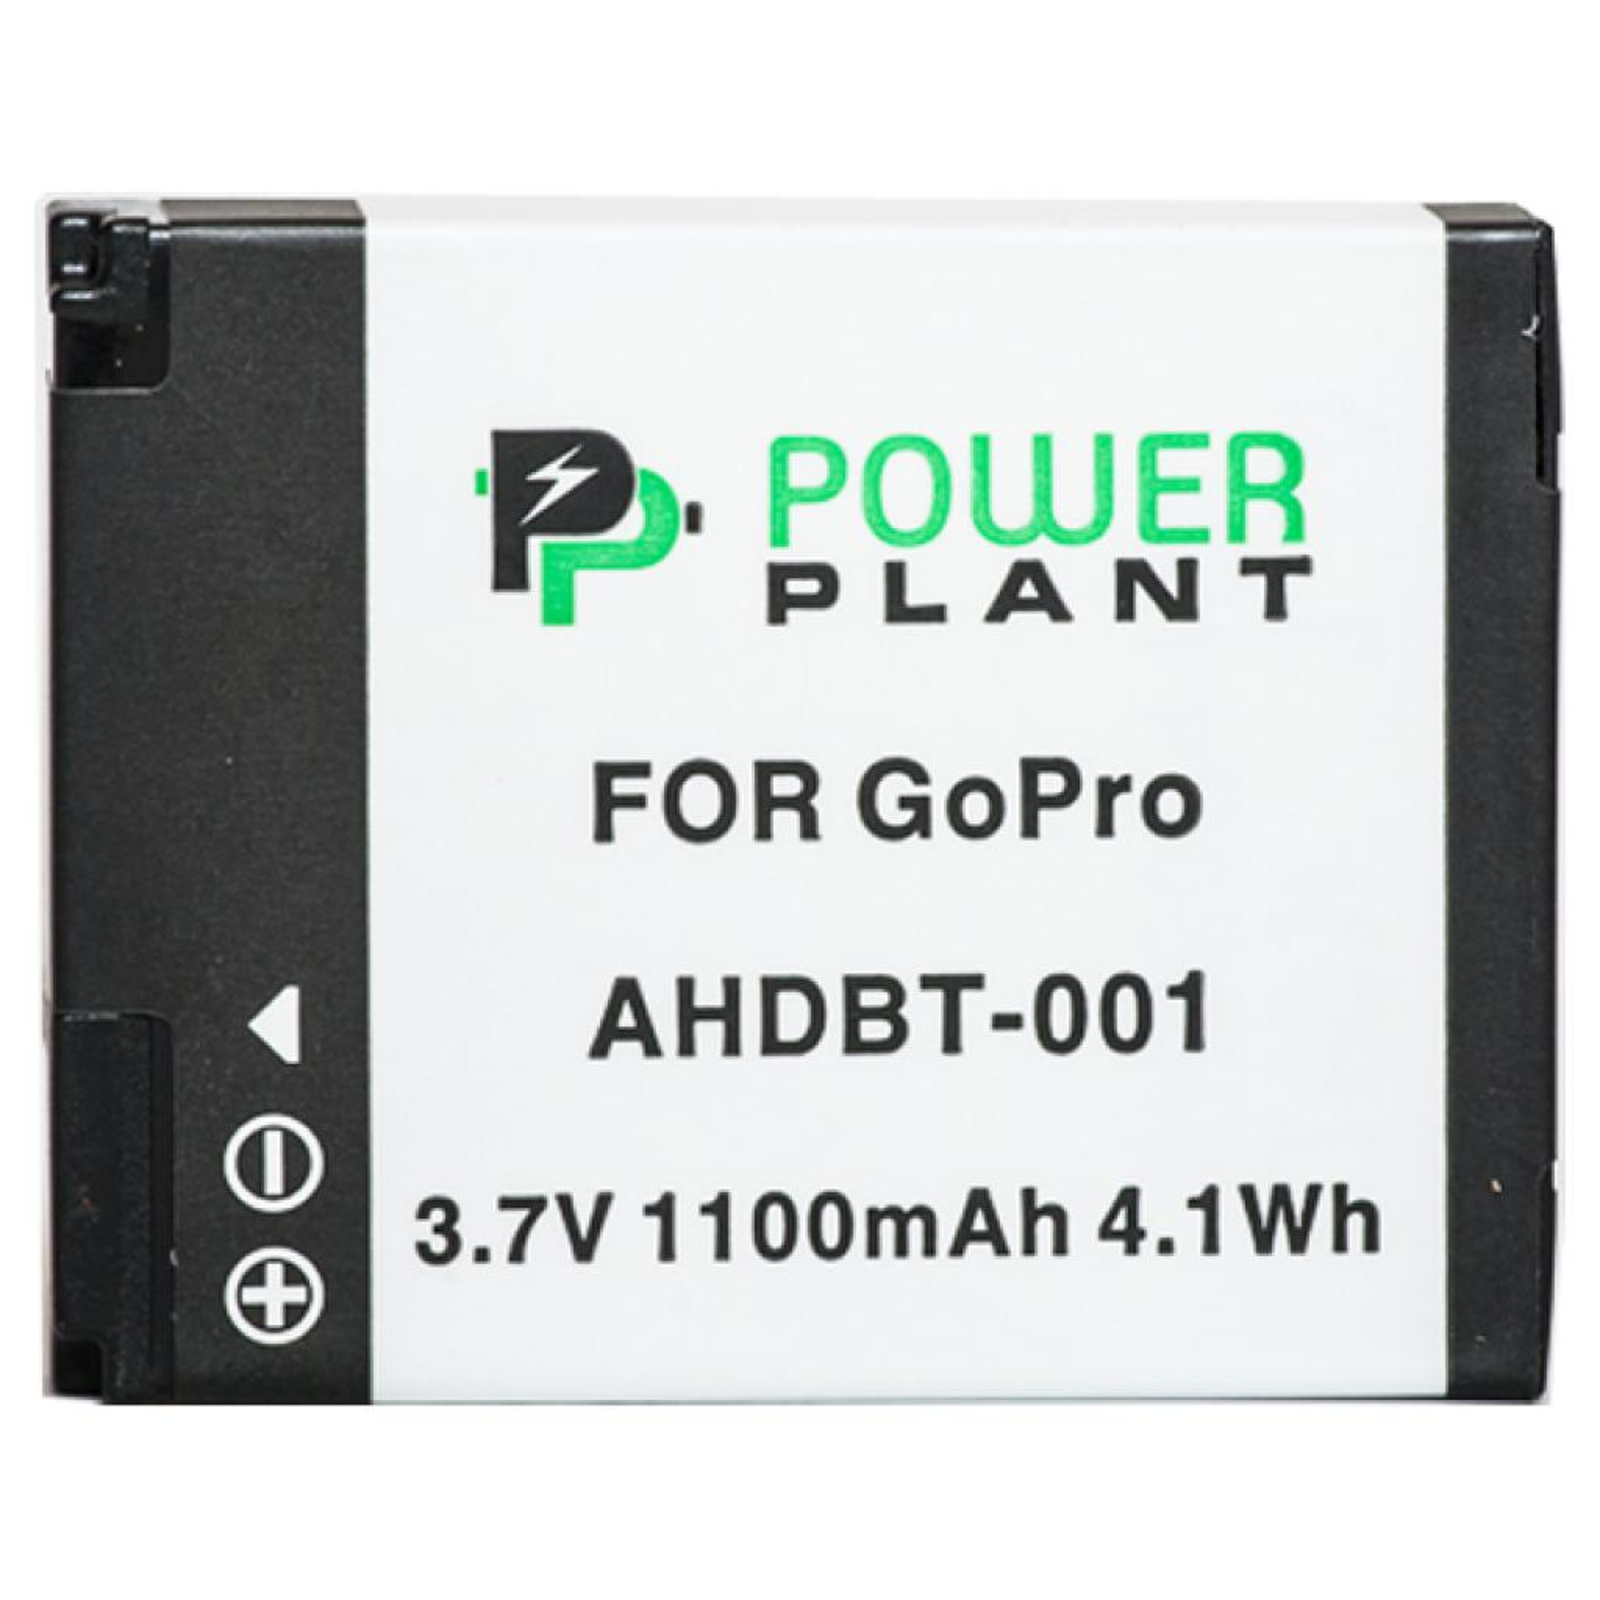 Аккумулятор к фото/видео PowerPlant GoPro AHDBT-001 (DV00DV1359) изображение 2